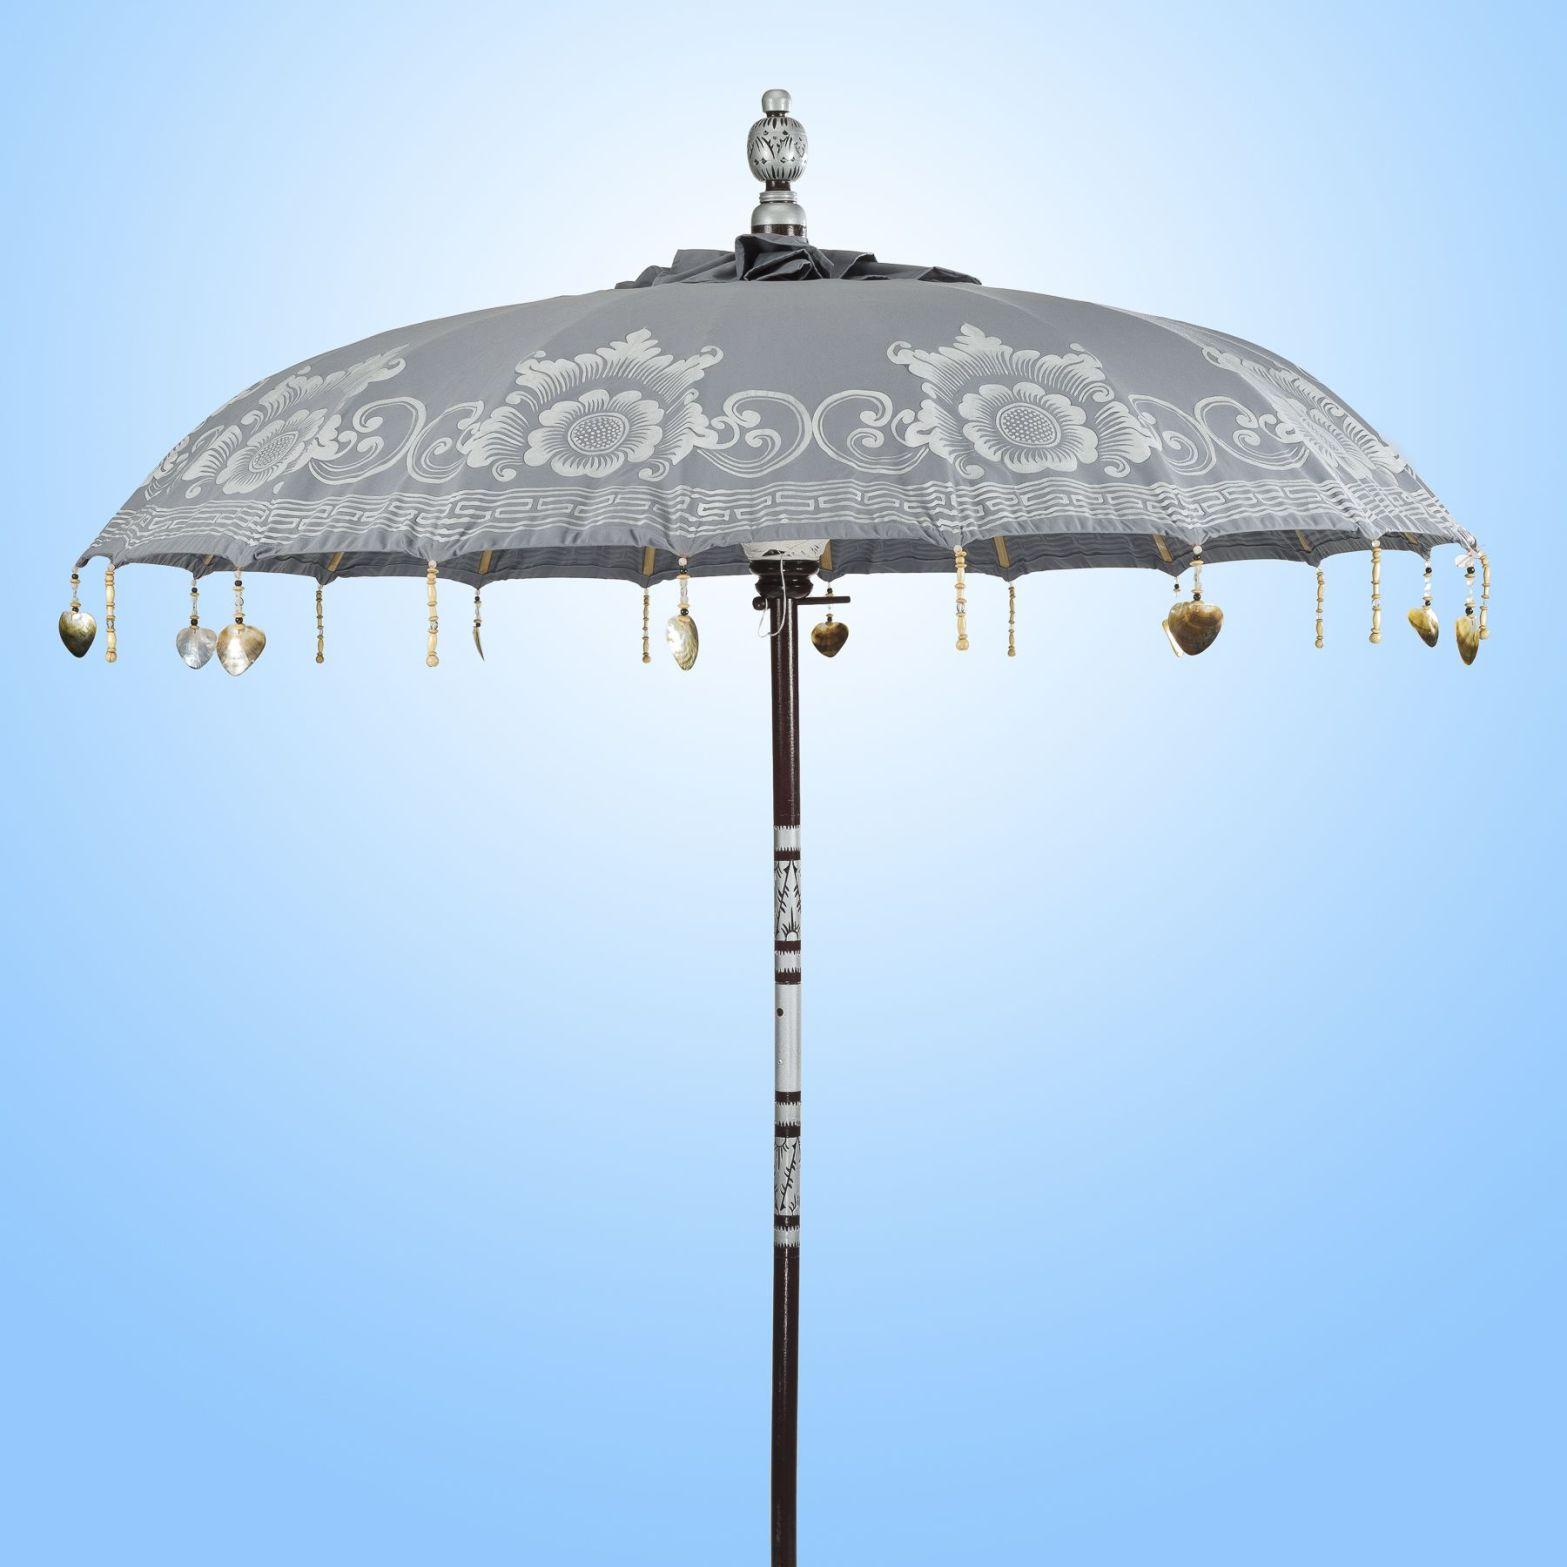 Bali Parasols - the Best Bali Parasols, order Bali Parasols